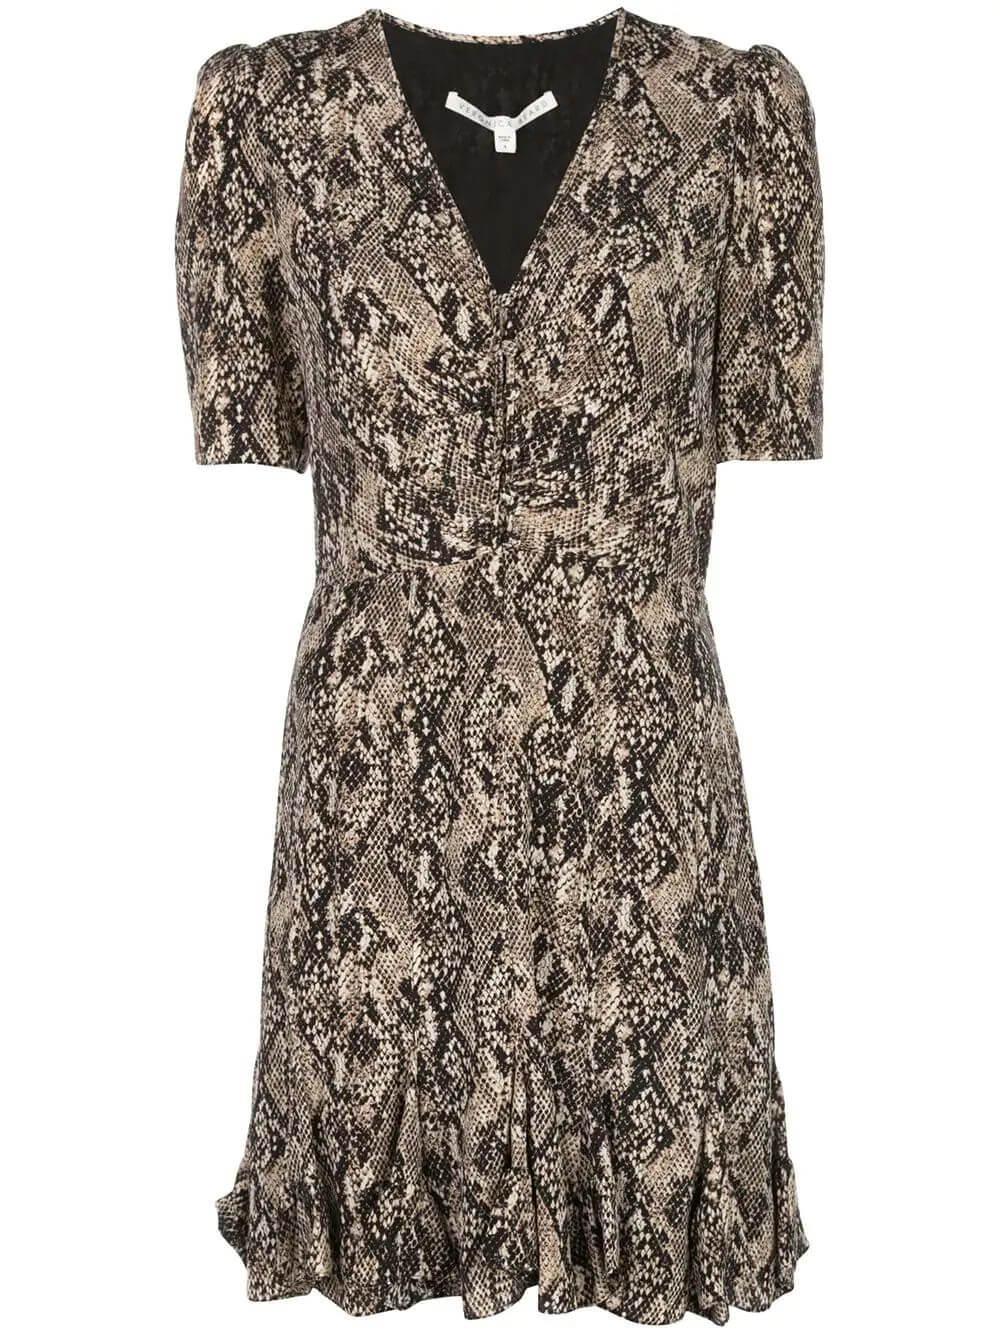 Short Sleeve Ried Dress Item # 2001CDC012778